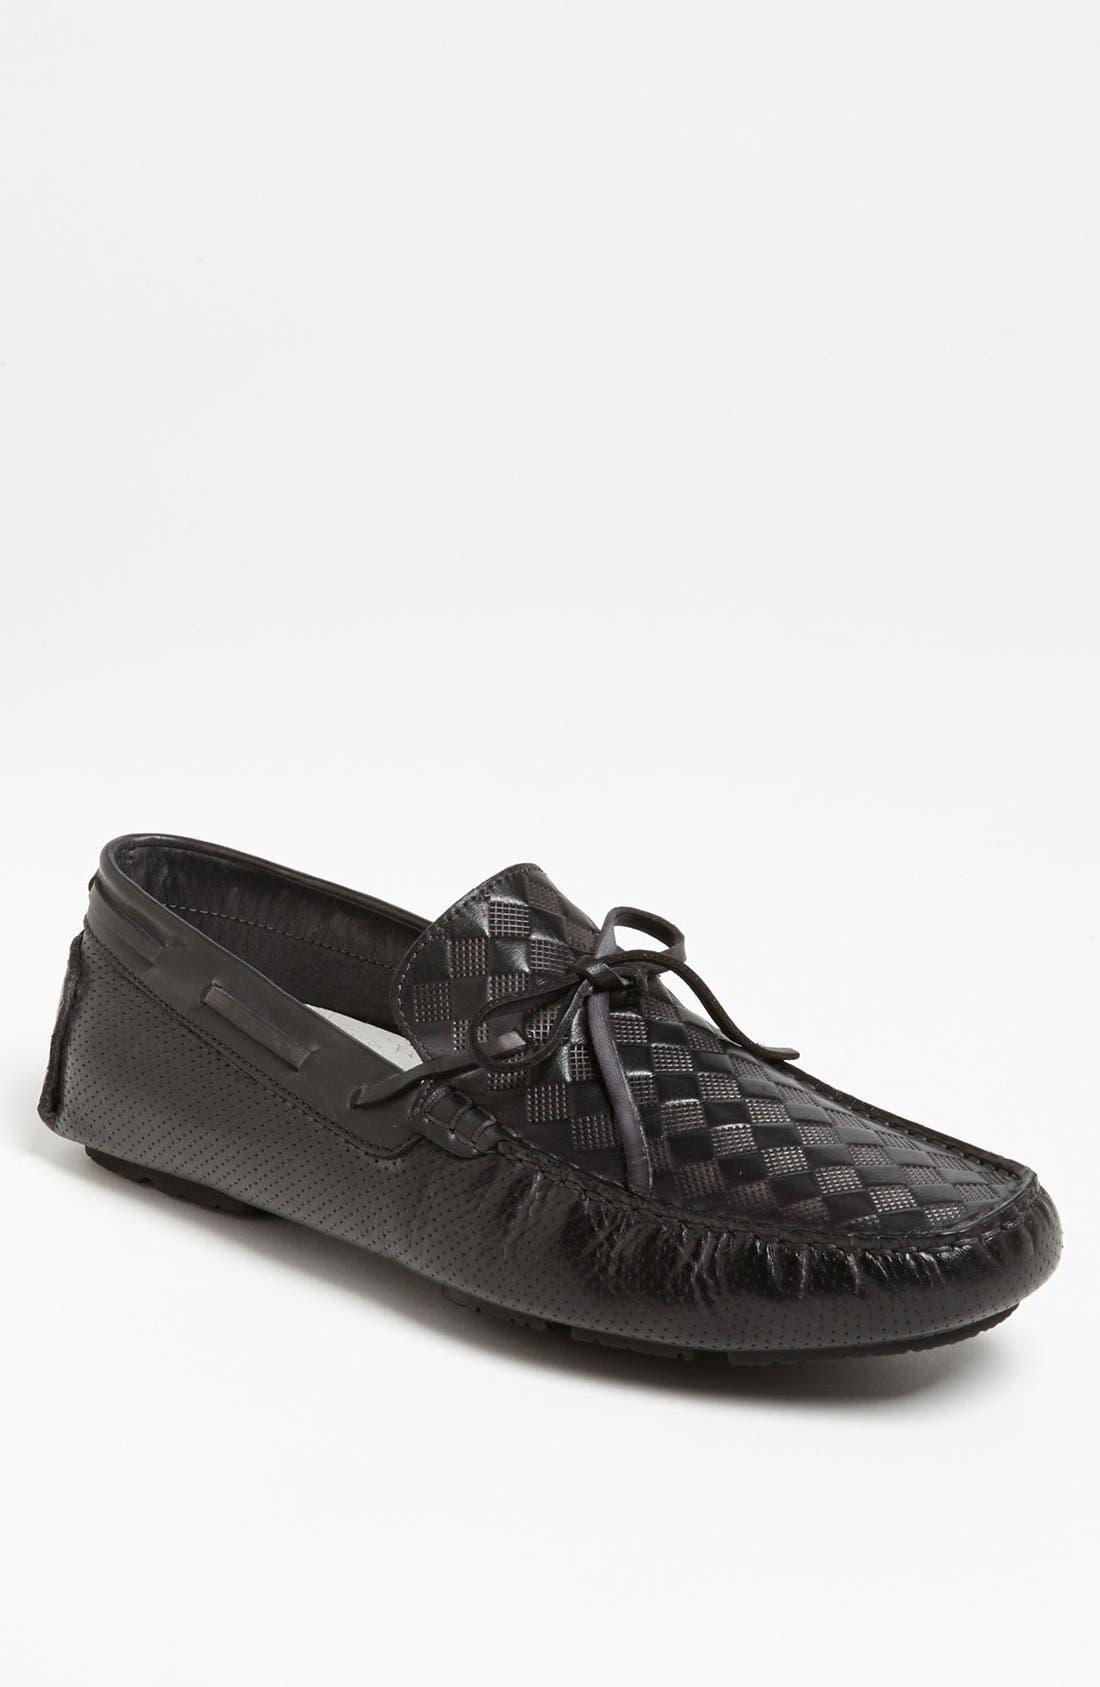 Main Image - Bacco Bucci 'Balotelli' Driving Shoe (Men)